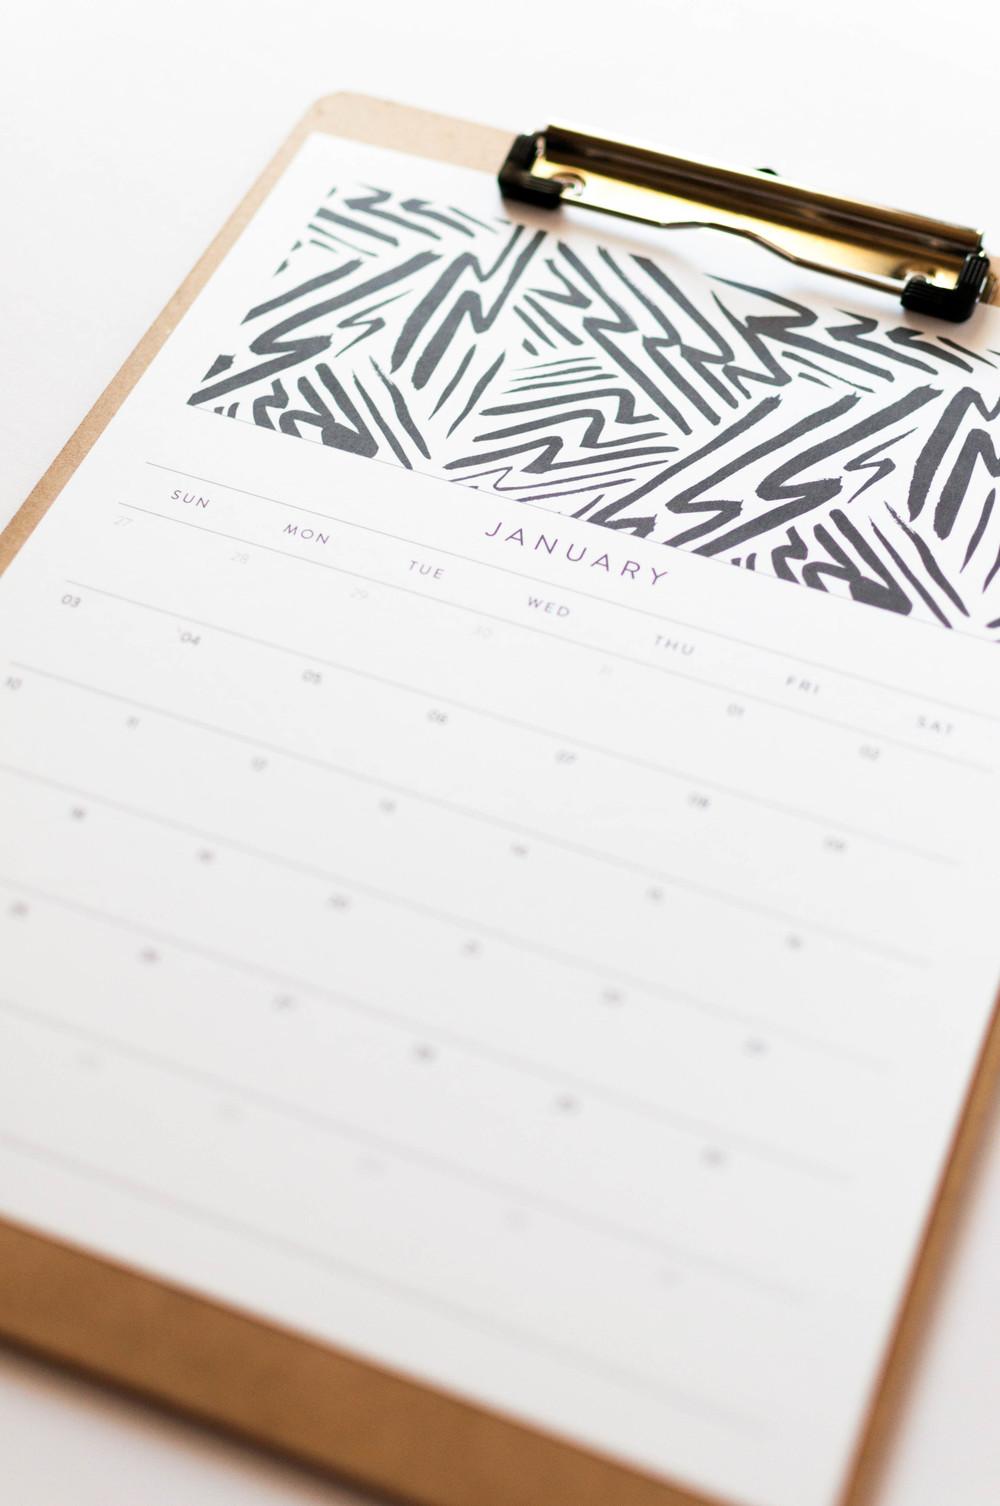 Free January 2016 Calendar Download